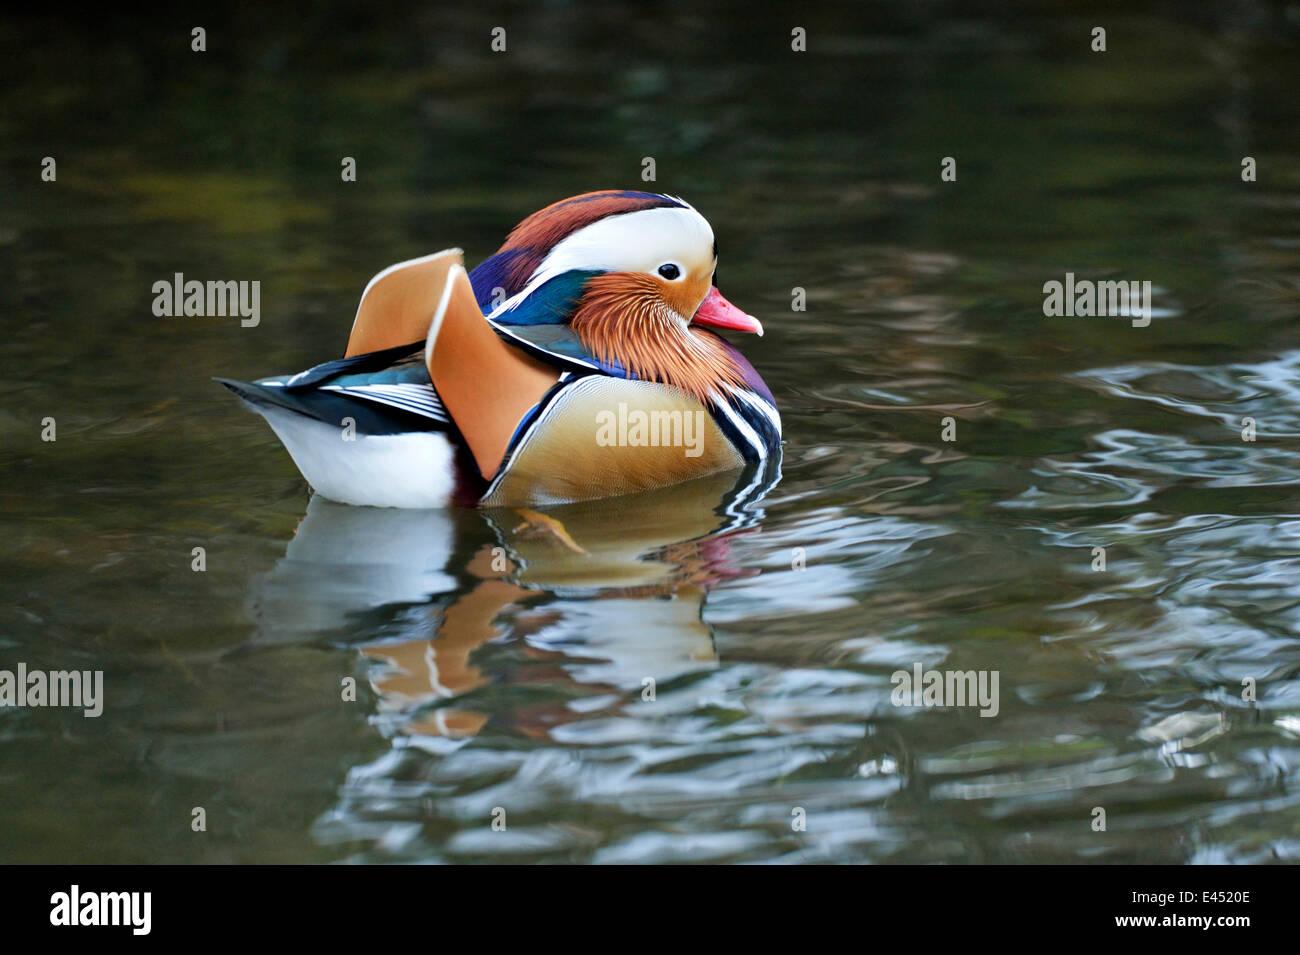 Mandarin Duck (Aix galericulata), Lake Zug, Canton of Zug, Switzerland - Stock Image